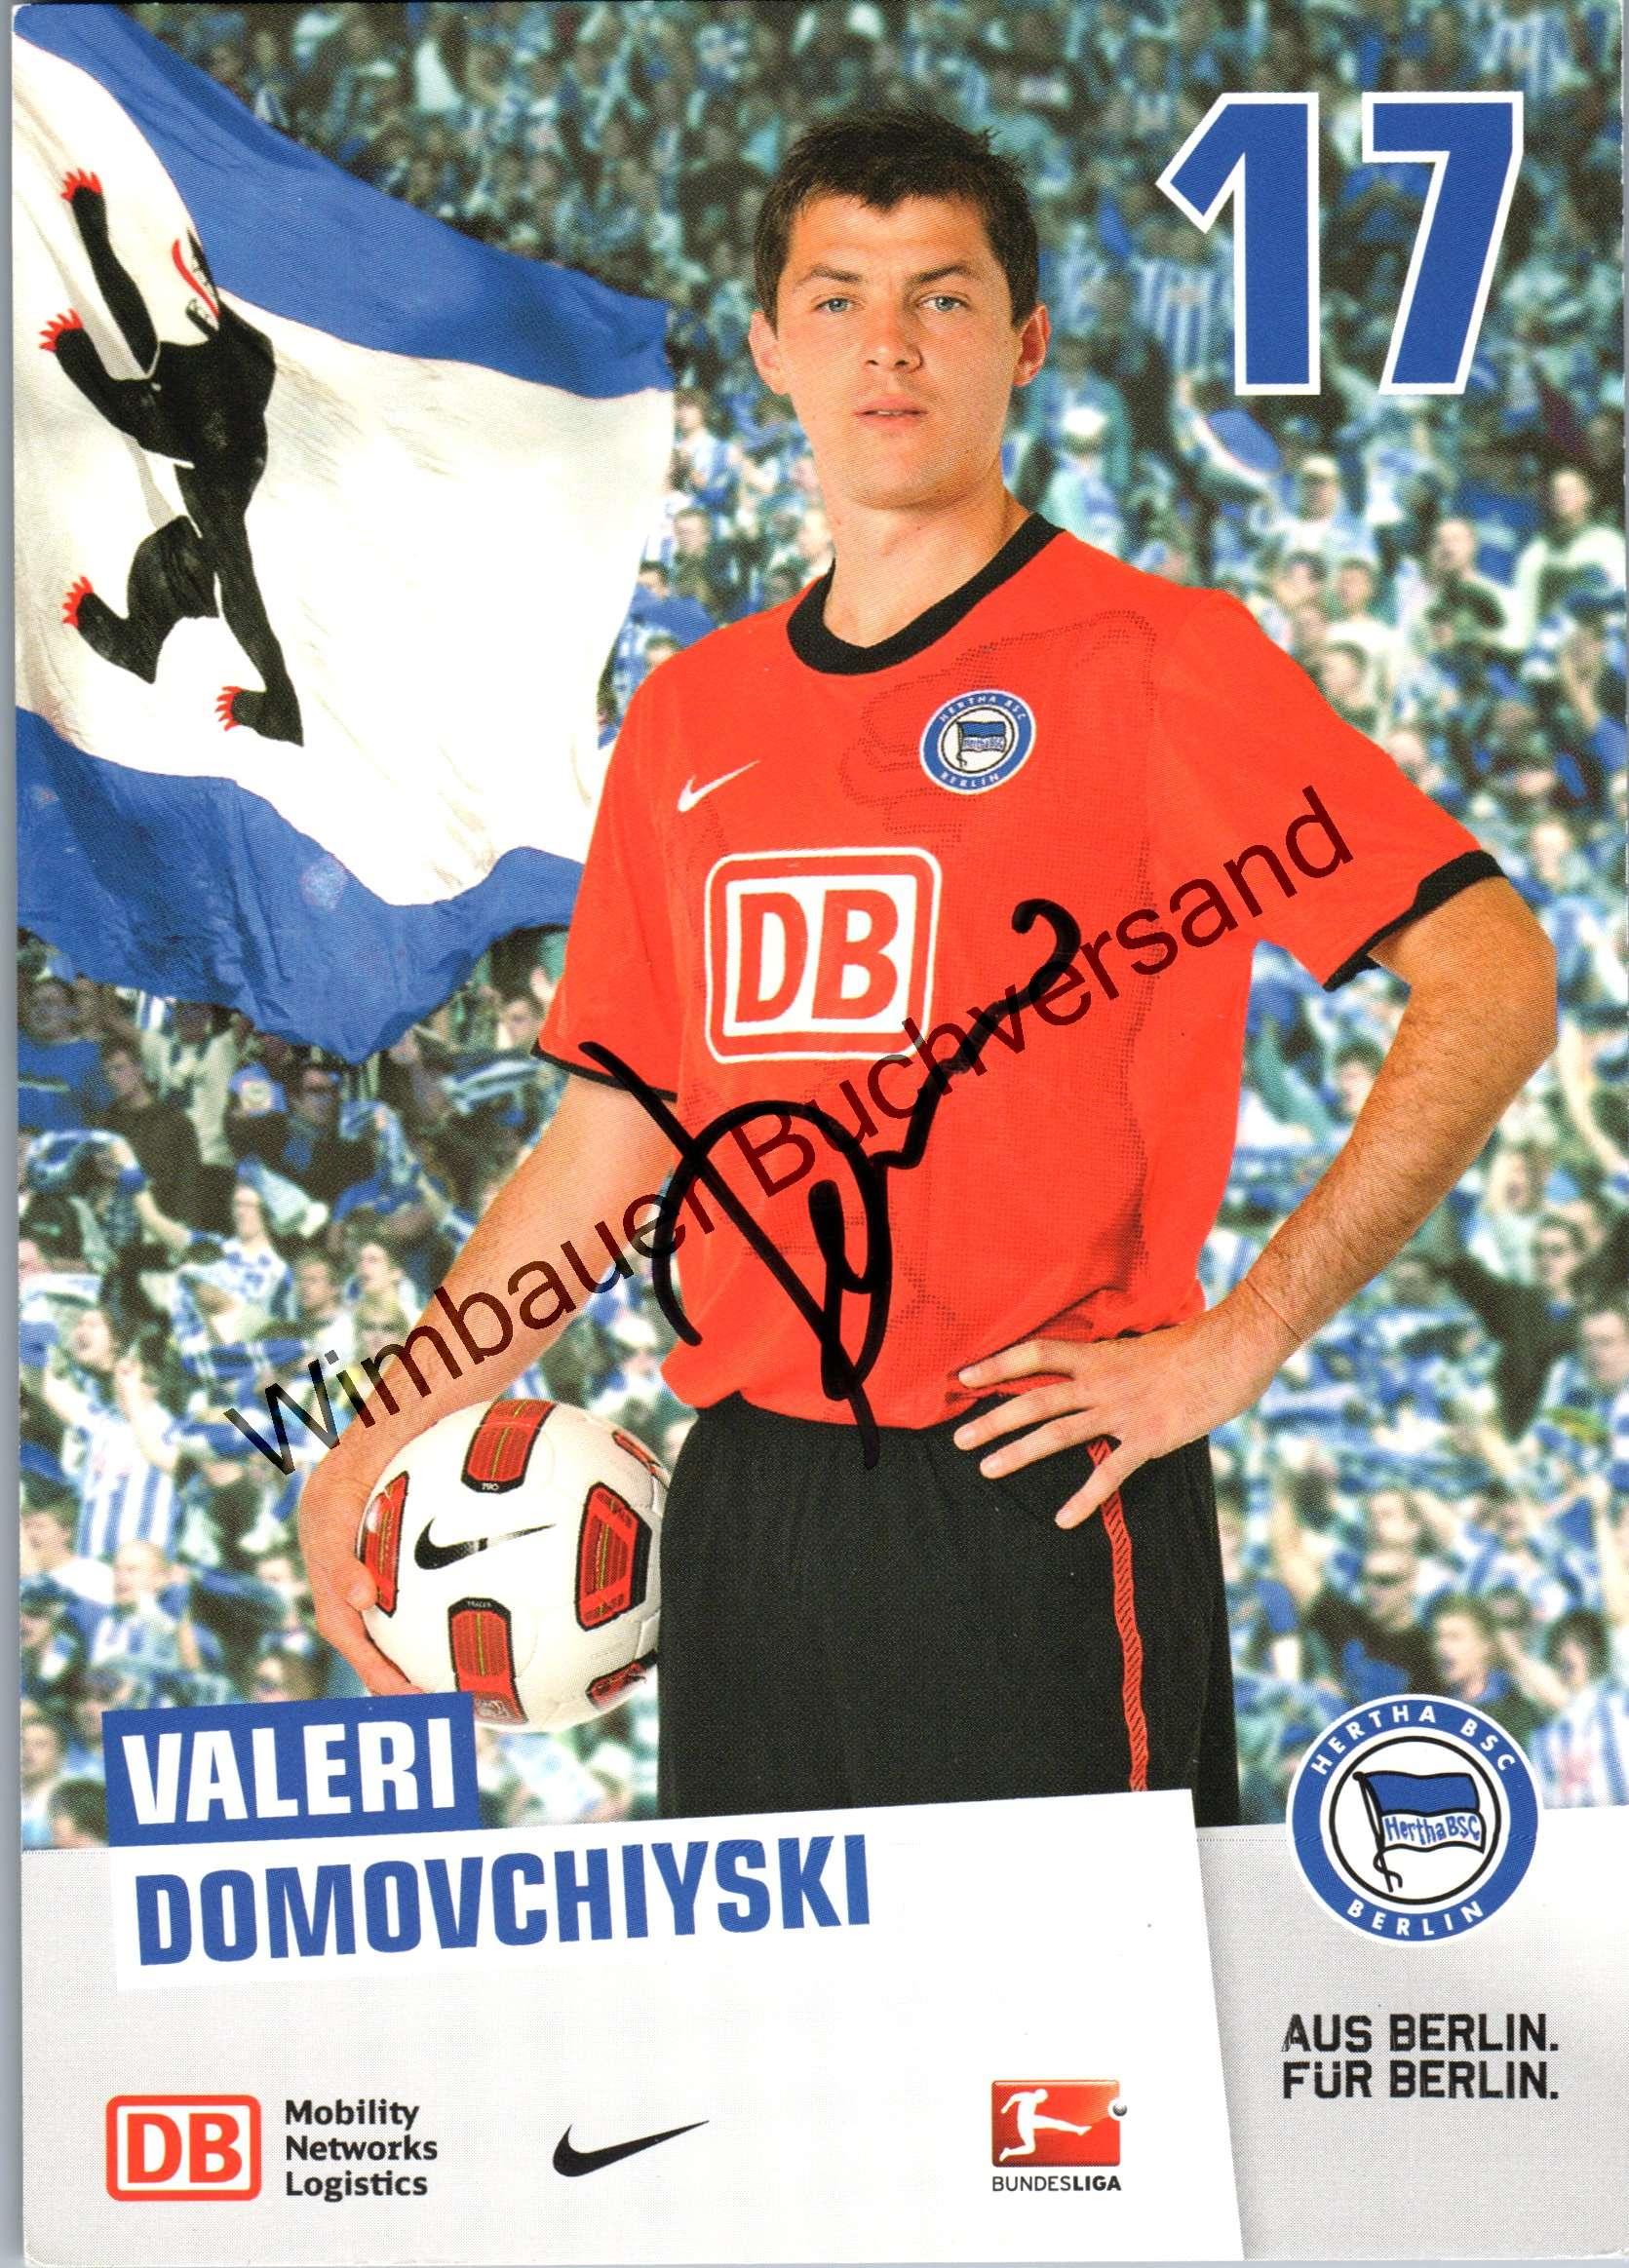 Domovchiyski, Valeri : Original Autogramm Valeri Domovchiyski Hertha BSC /// Autogramm Autograph signiert signed signee Saison 2010/2011